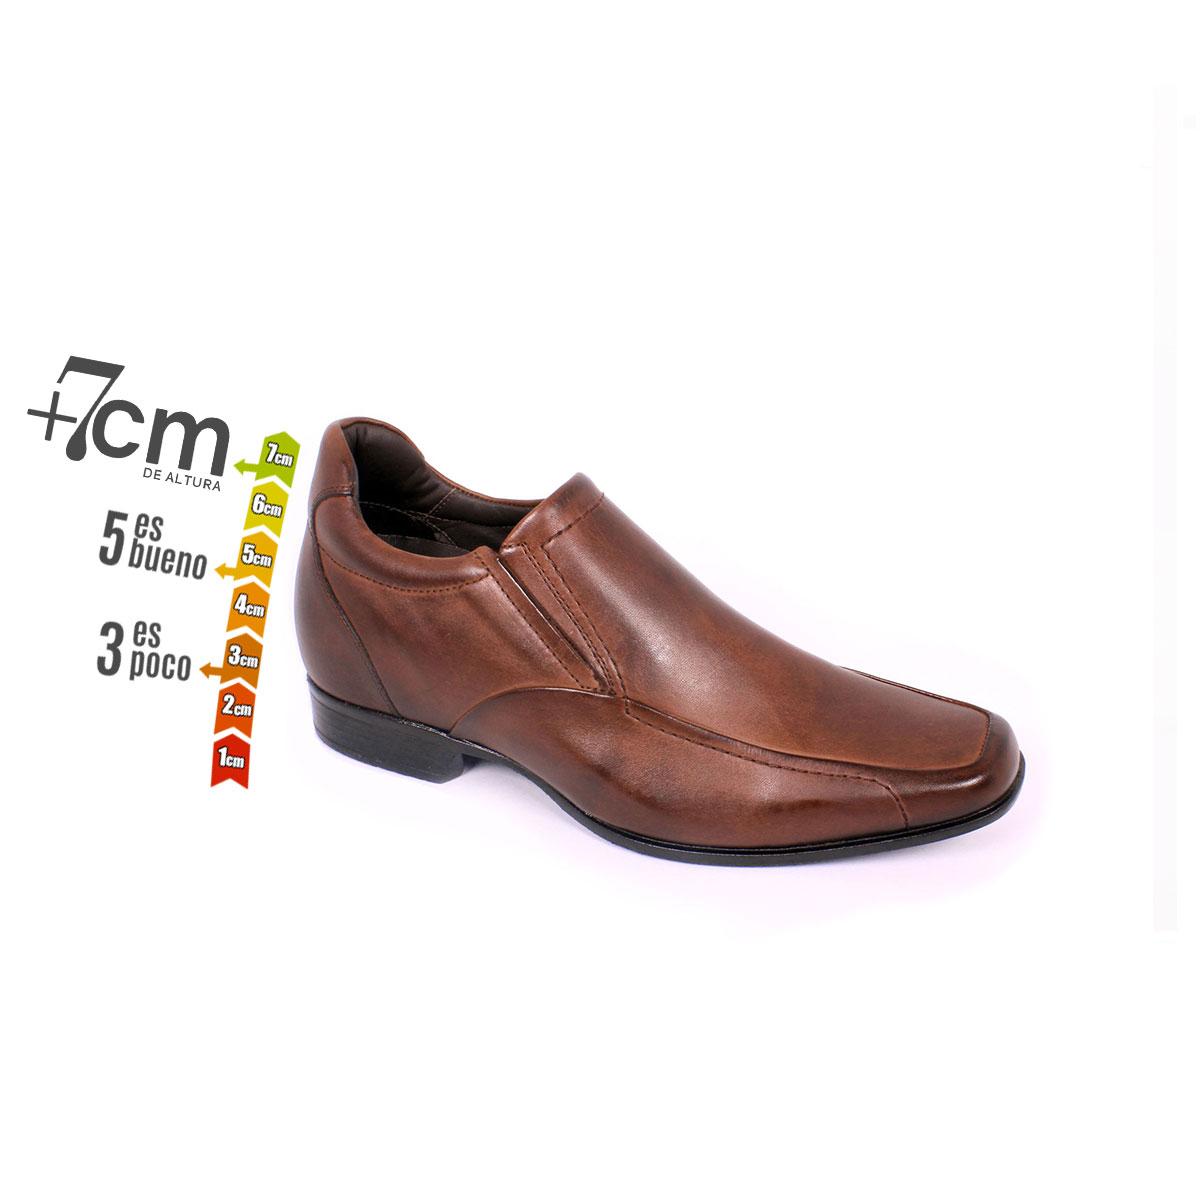 Zapato Formal Tabaco Café Max Denegri +7cm de Altura_74160